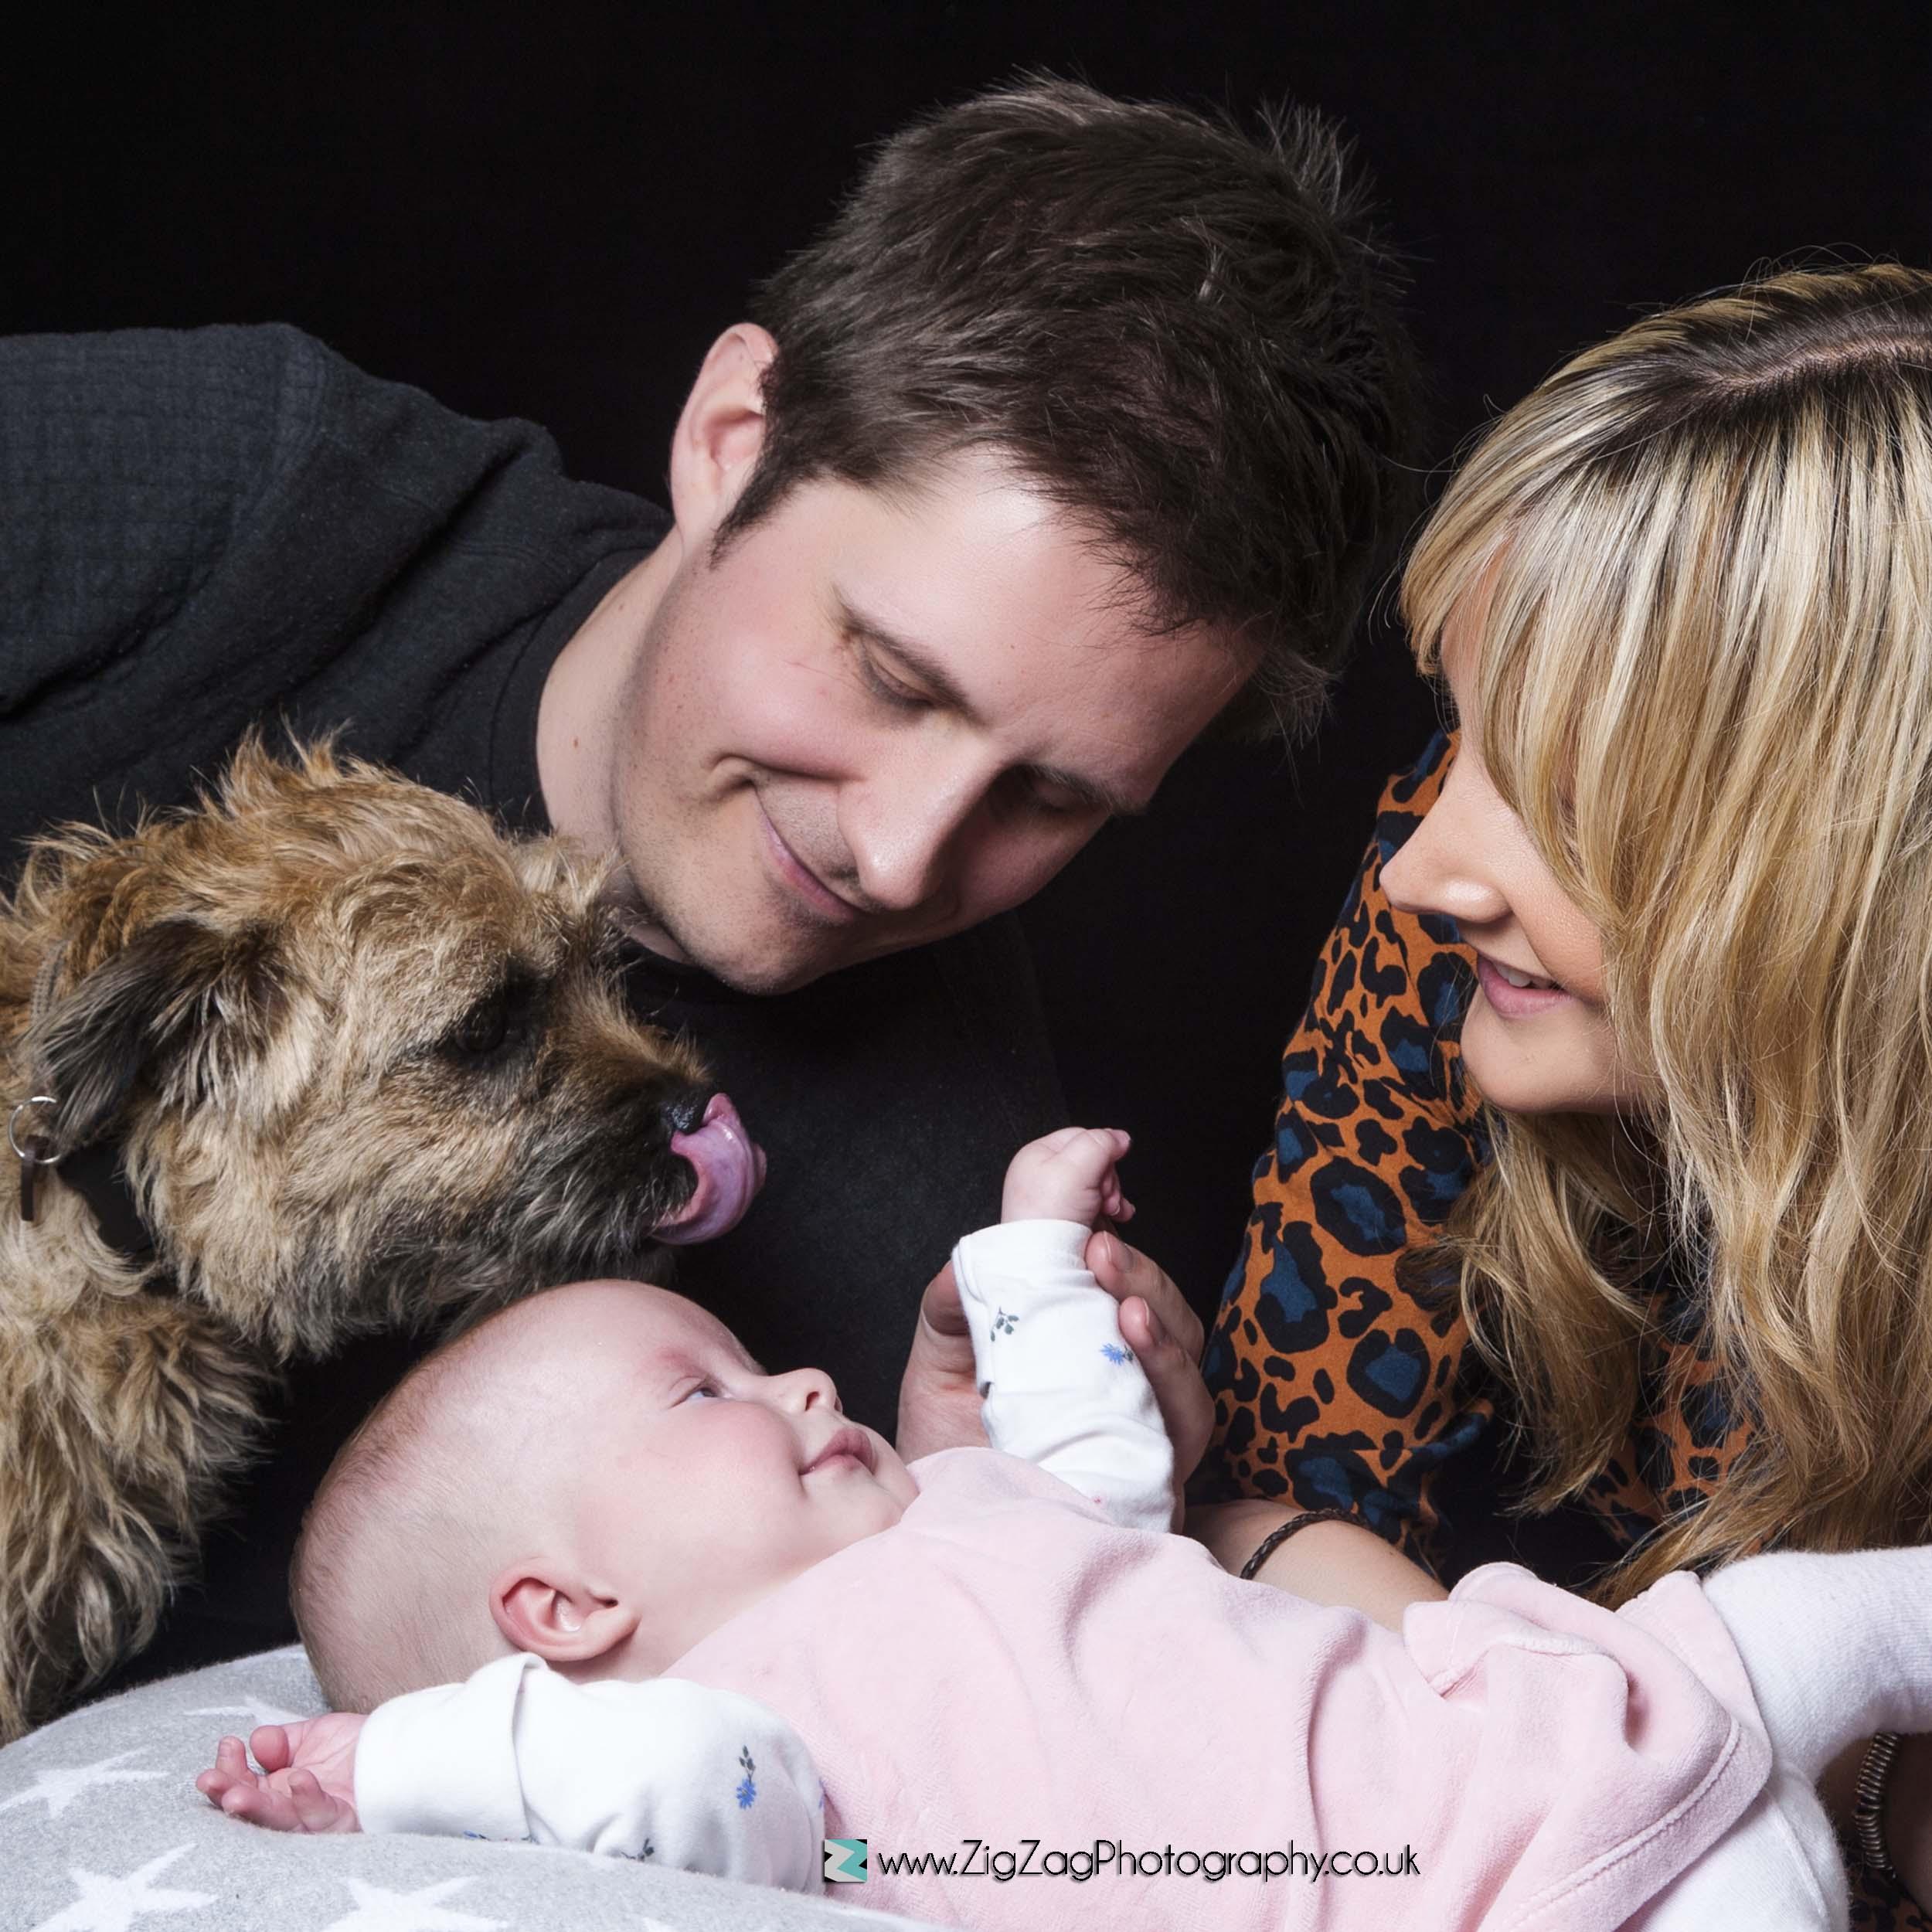 photography-session-leicester-photoshoot-studio-zigzag-baby-dog-animal-pets-mum-dad-family-newborn-ideas-lick.jpg